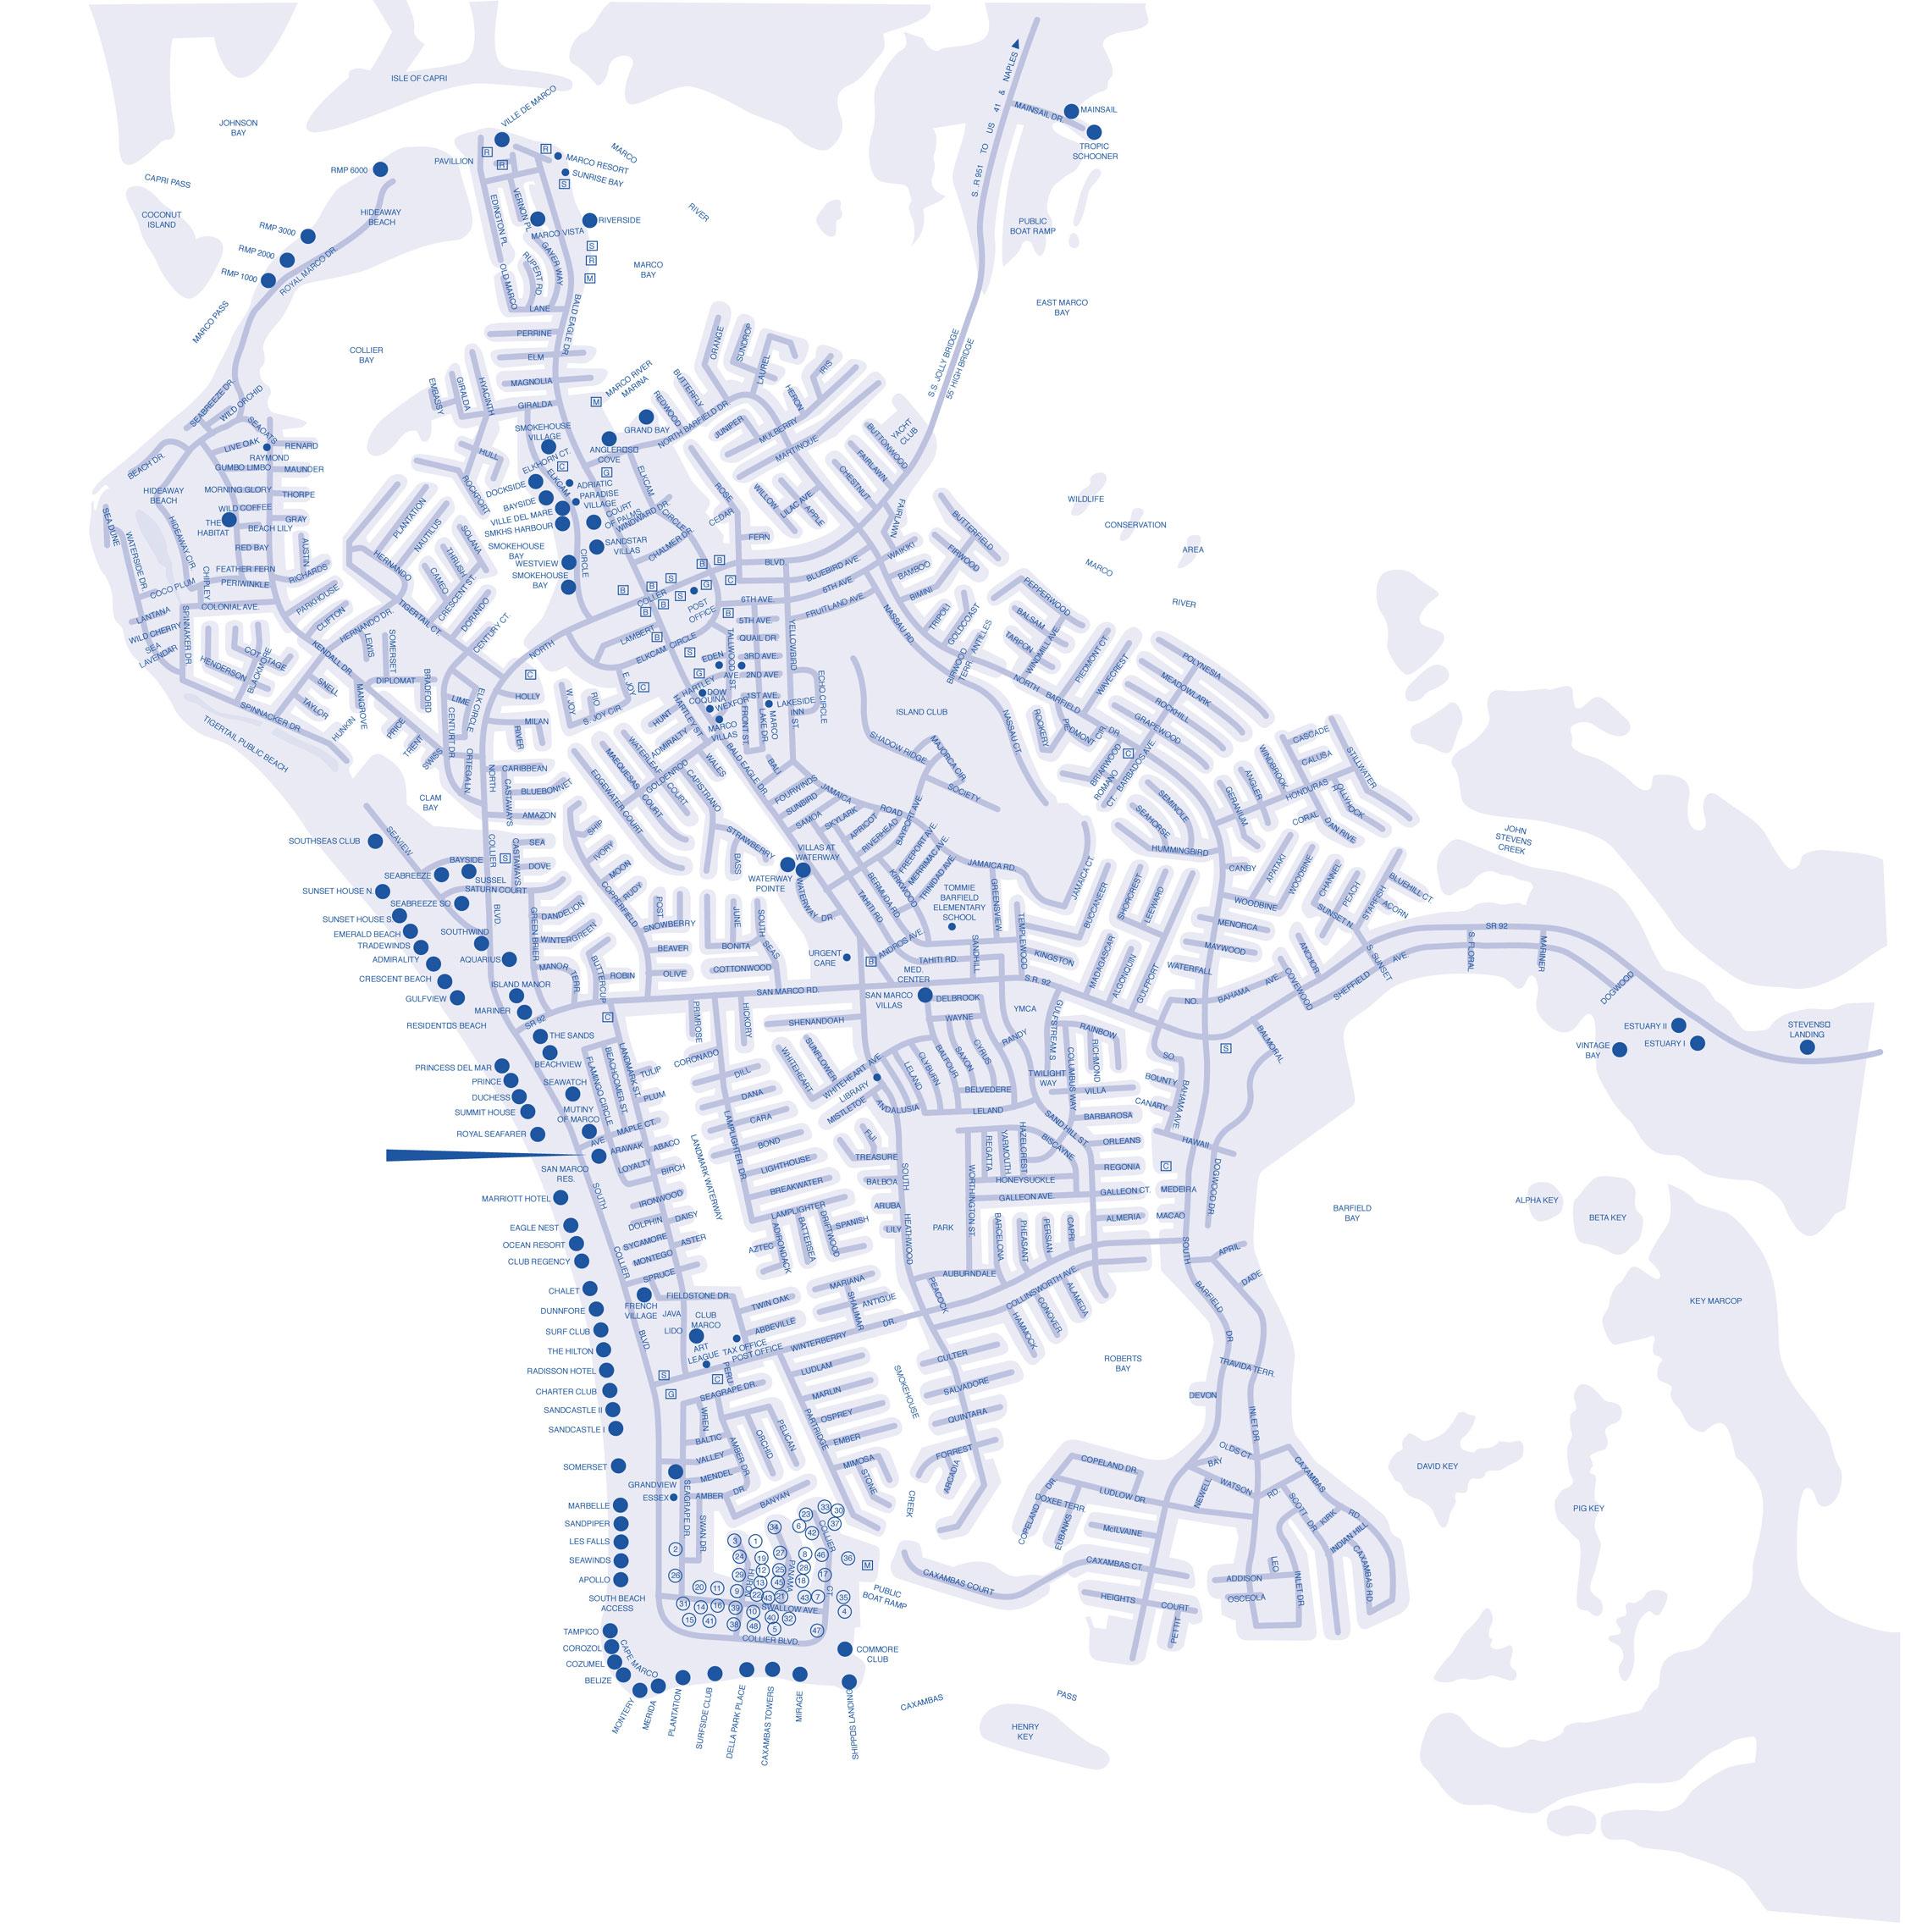 Map Of Marco Island Florida.Marco Island Hotel Map Marco Island Florida Mappery